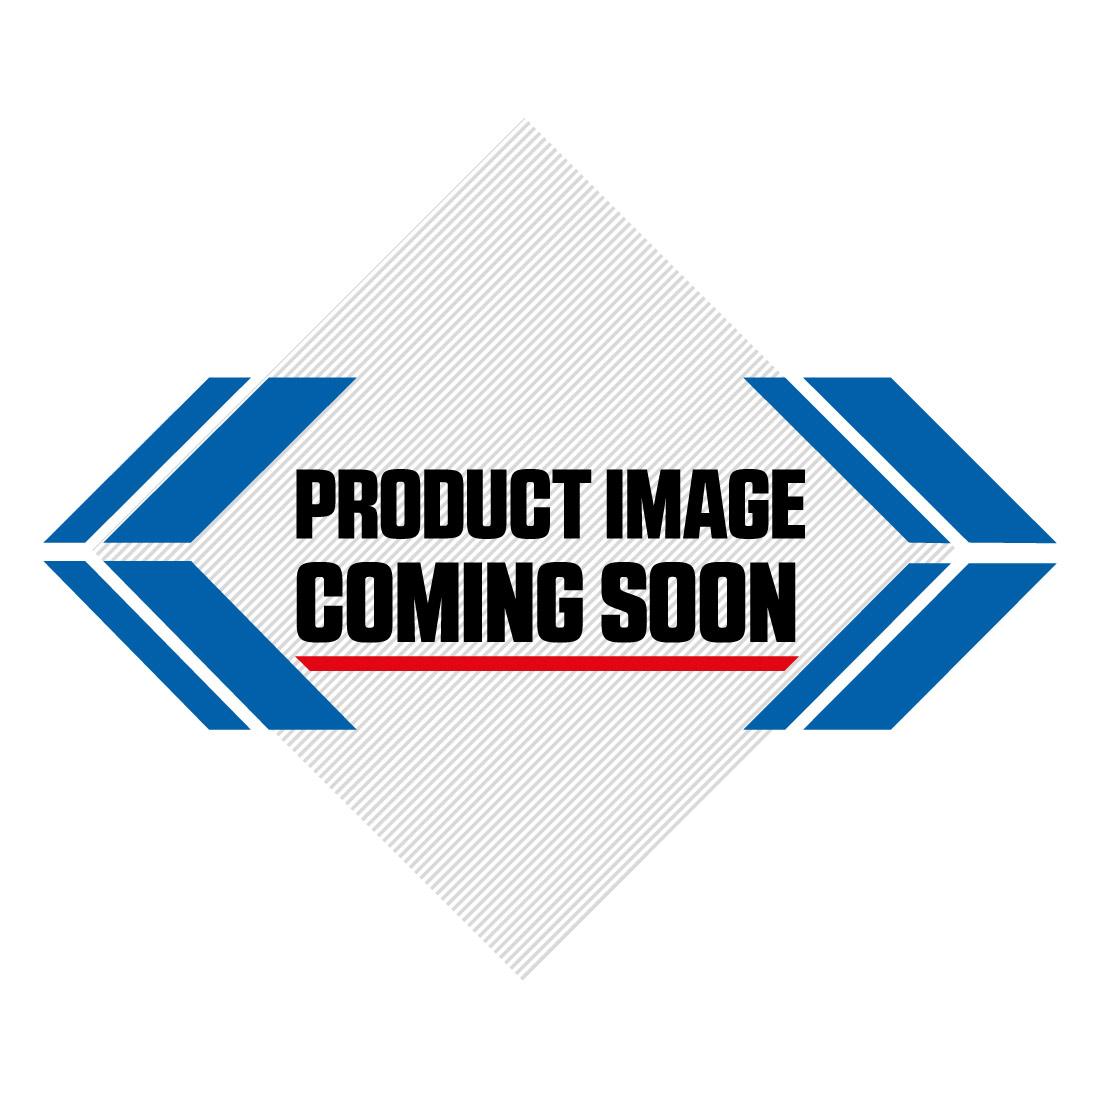 UFO Division Acqua Marina Motocross Kit Combo Image-0